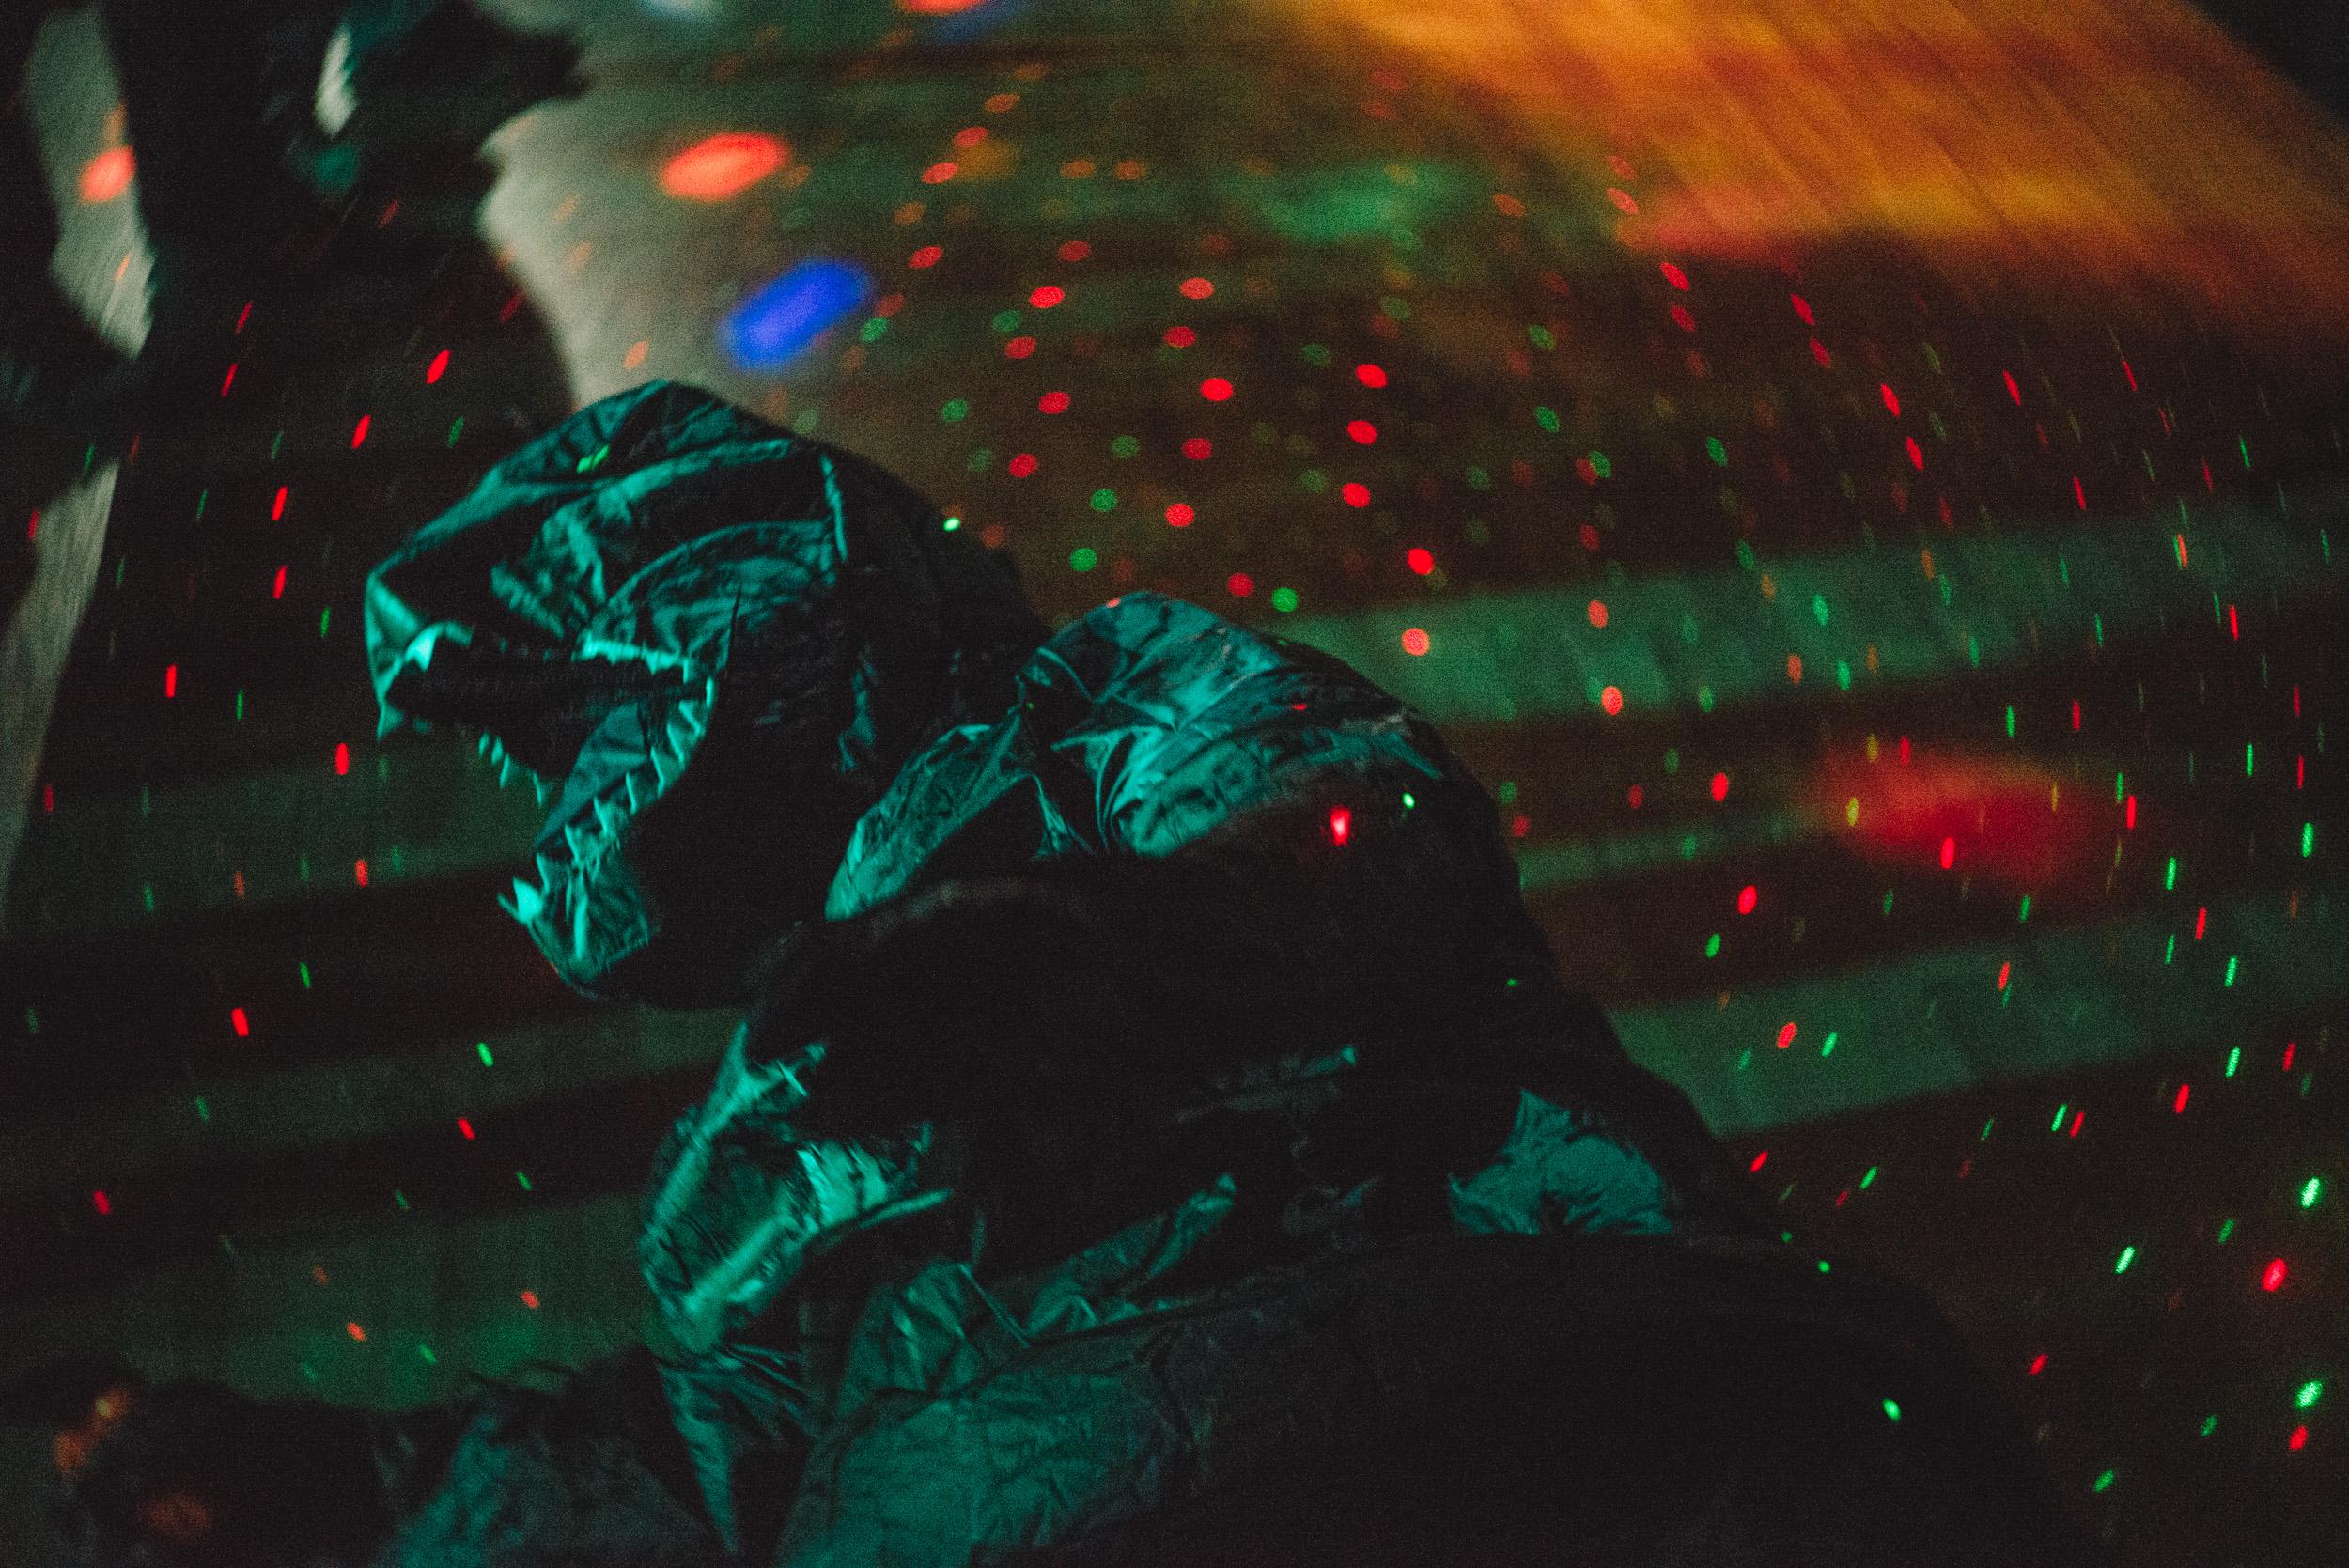 kaiju-daisenso-the-hub-island-park-ny-long-island-music-scene-grindcore-49.jpg